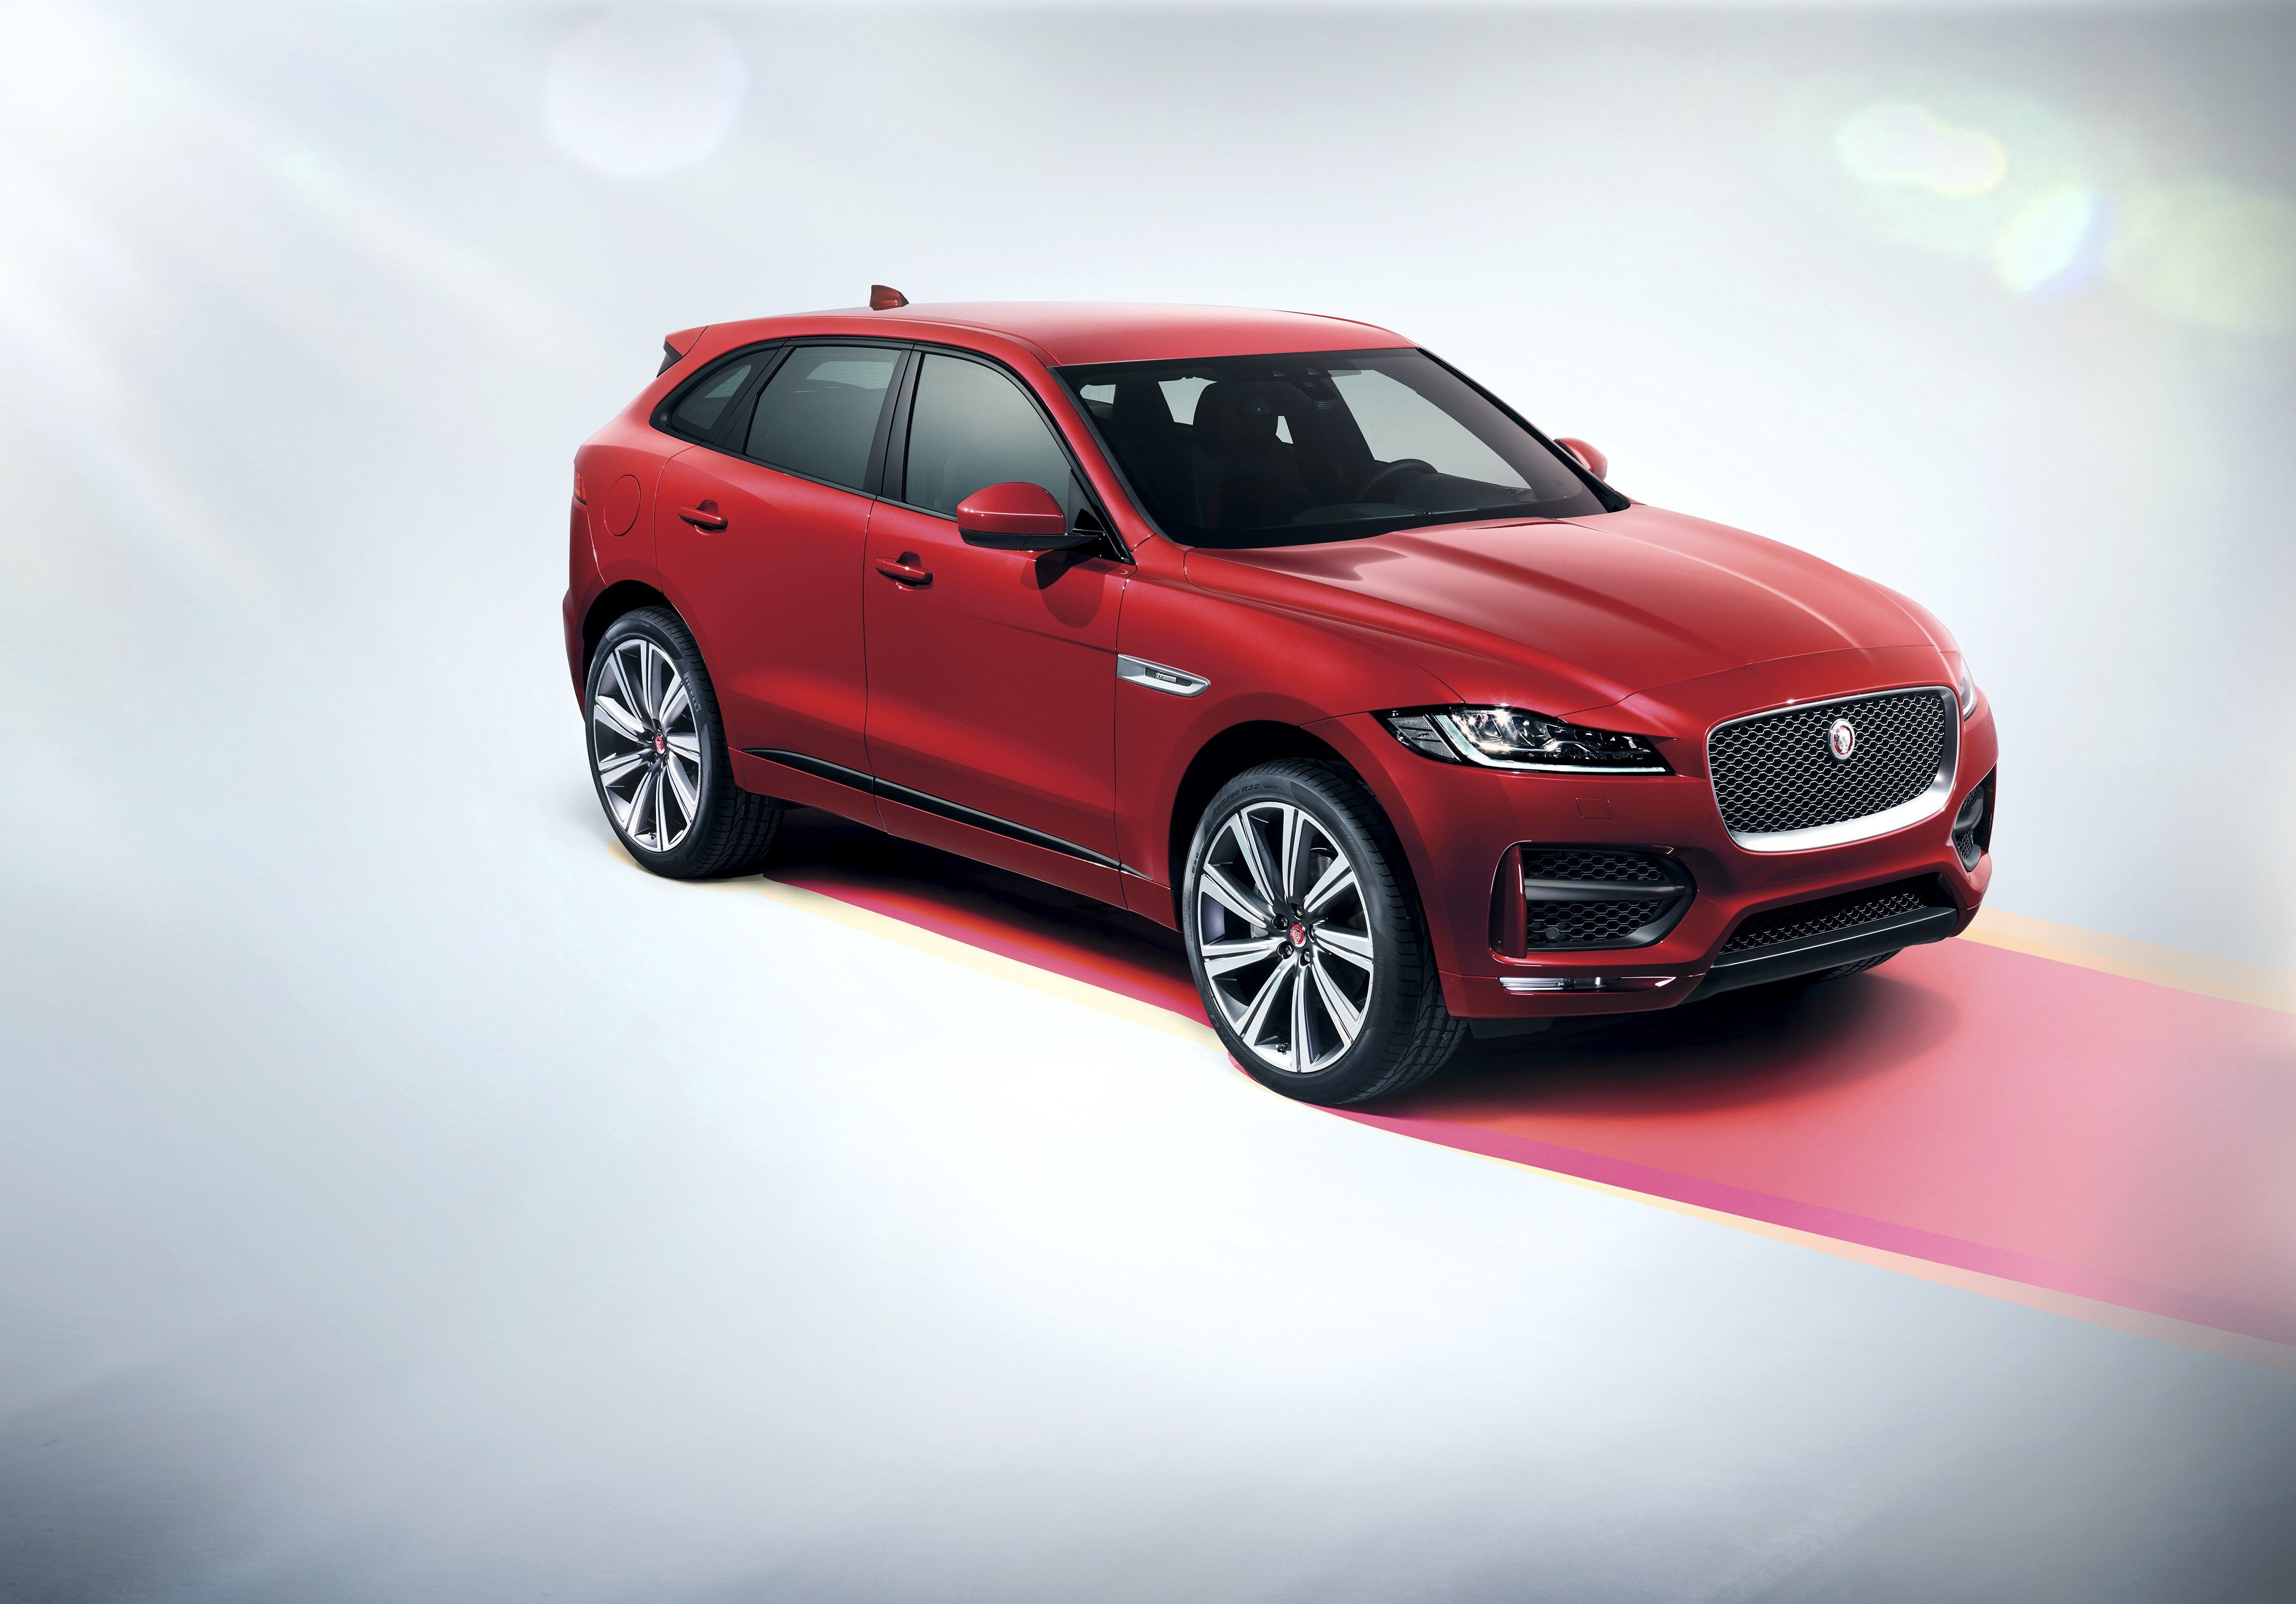 driver photos f car r jaguar price reviews and pace sport specs